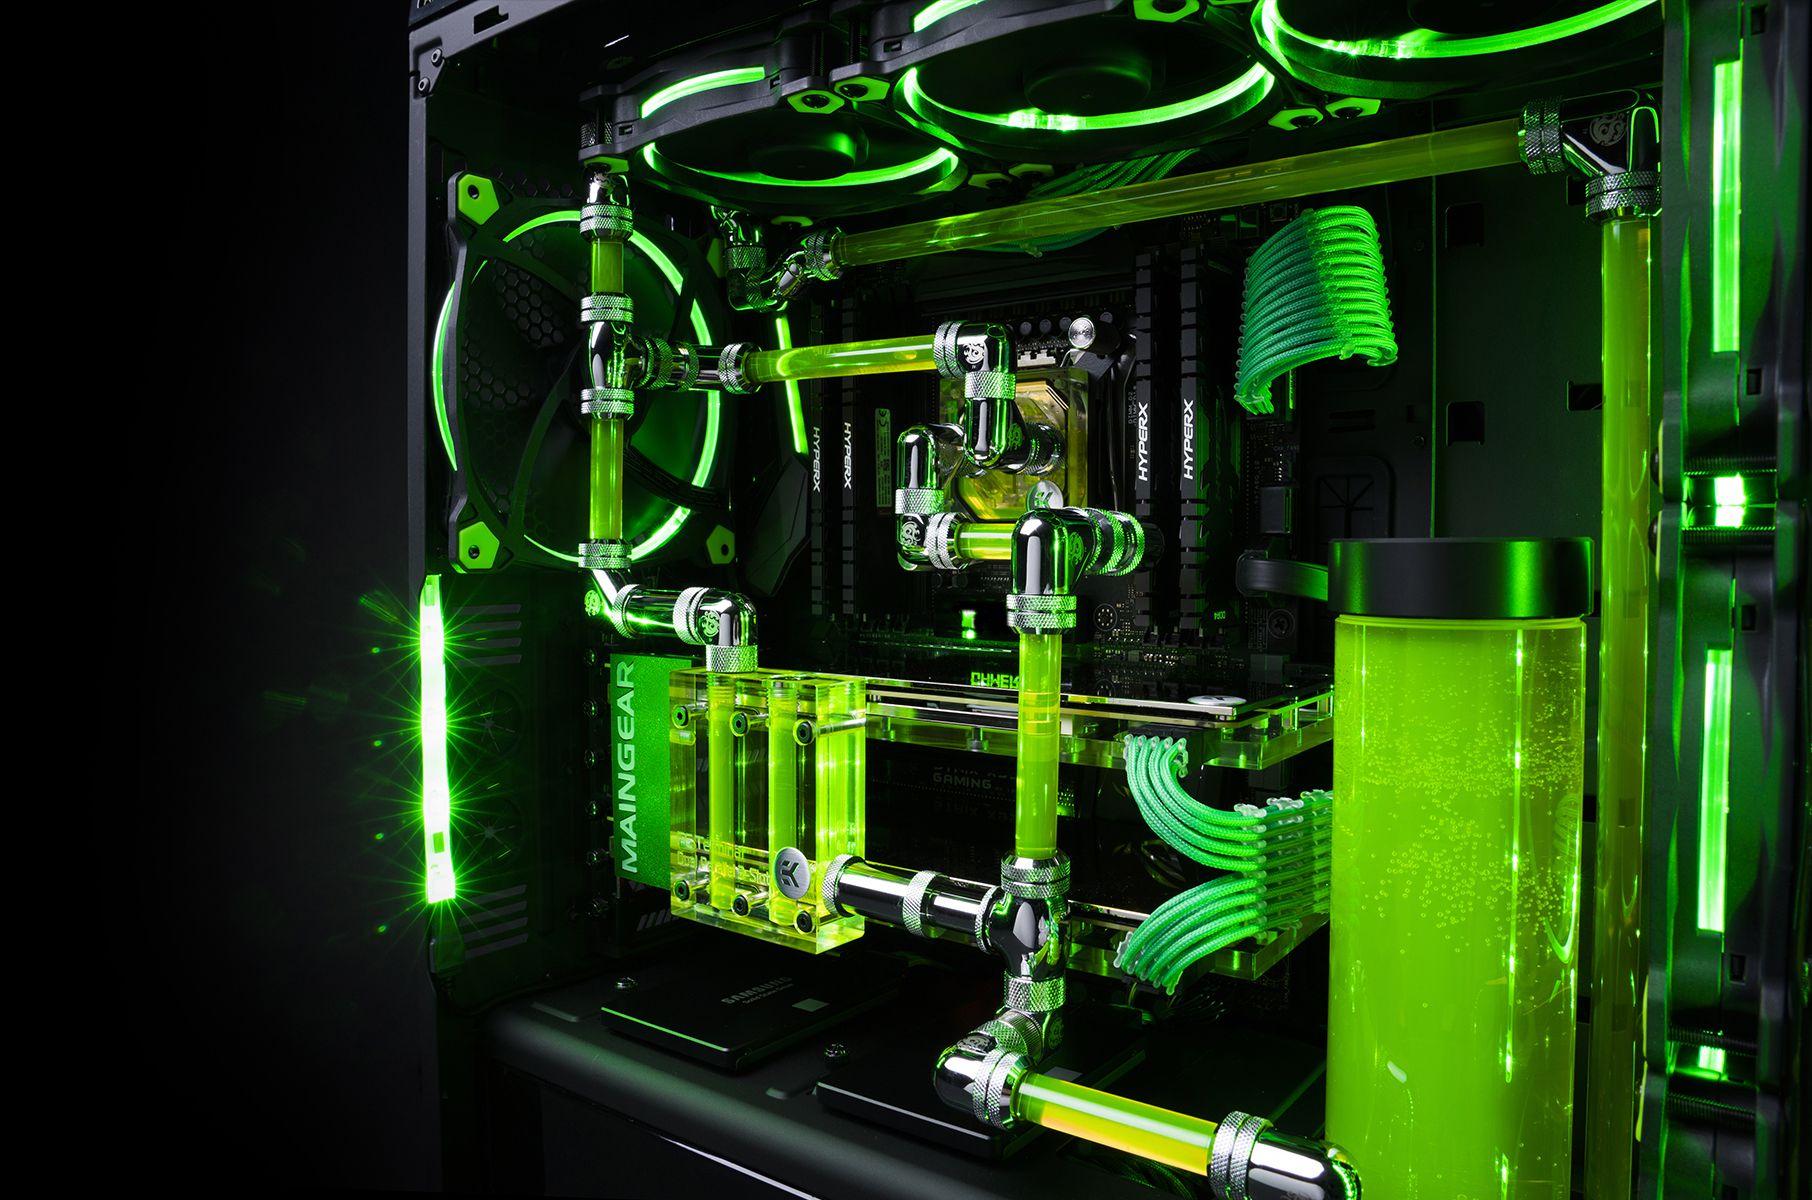 The glowing green liquid in this RazerMaingear gaming PC